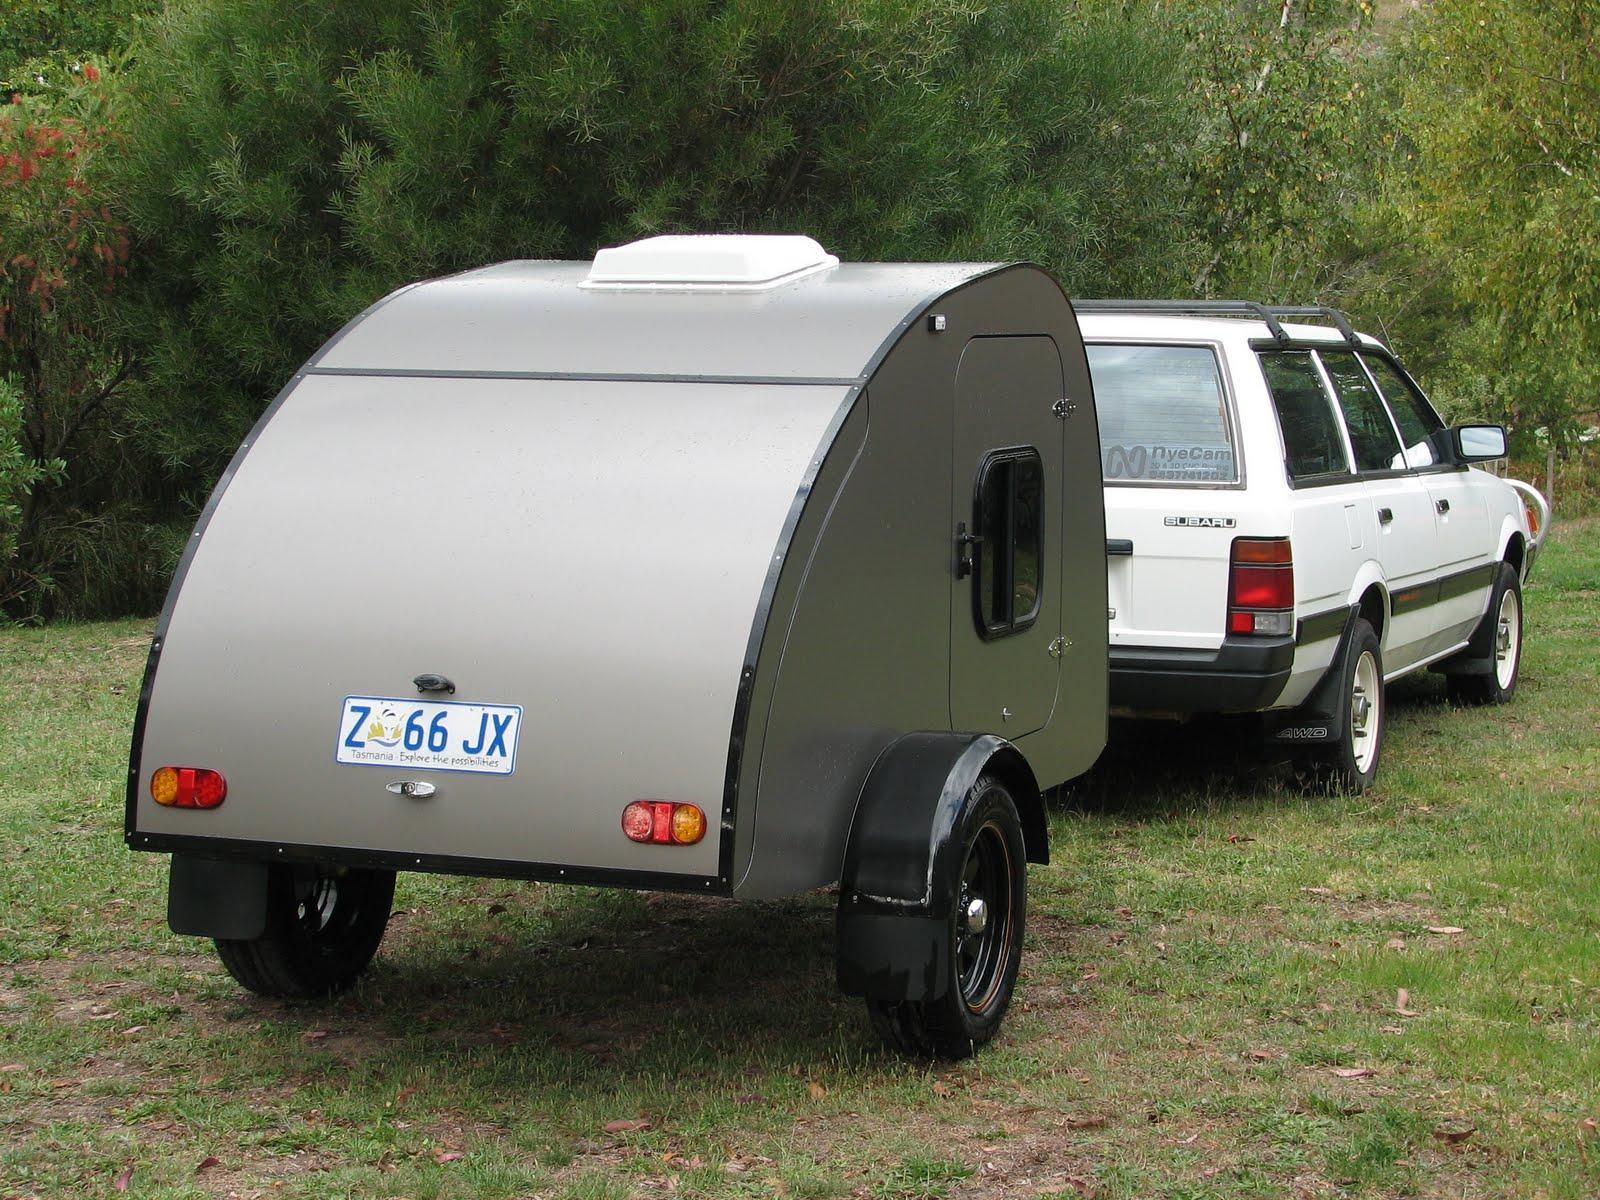 Nyecam Cnc Routing Teardrop Camper Kits